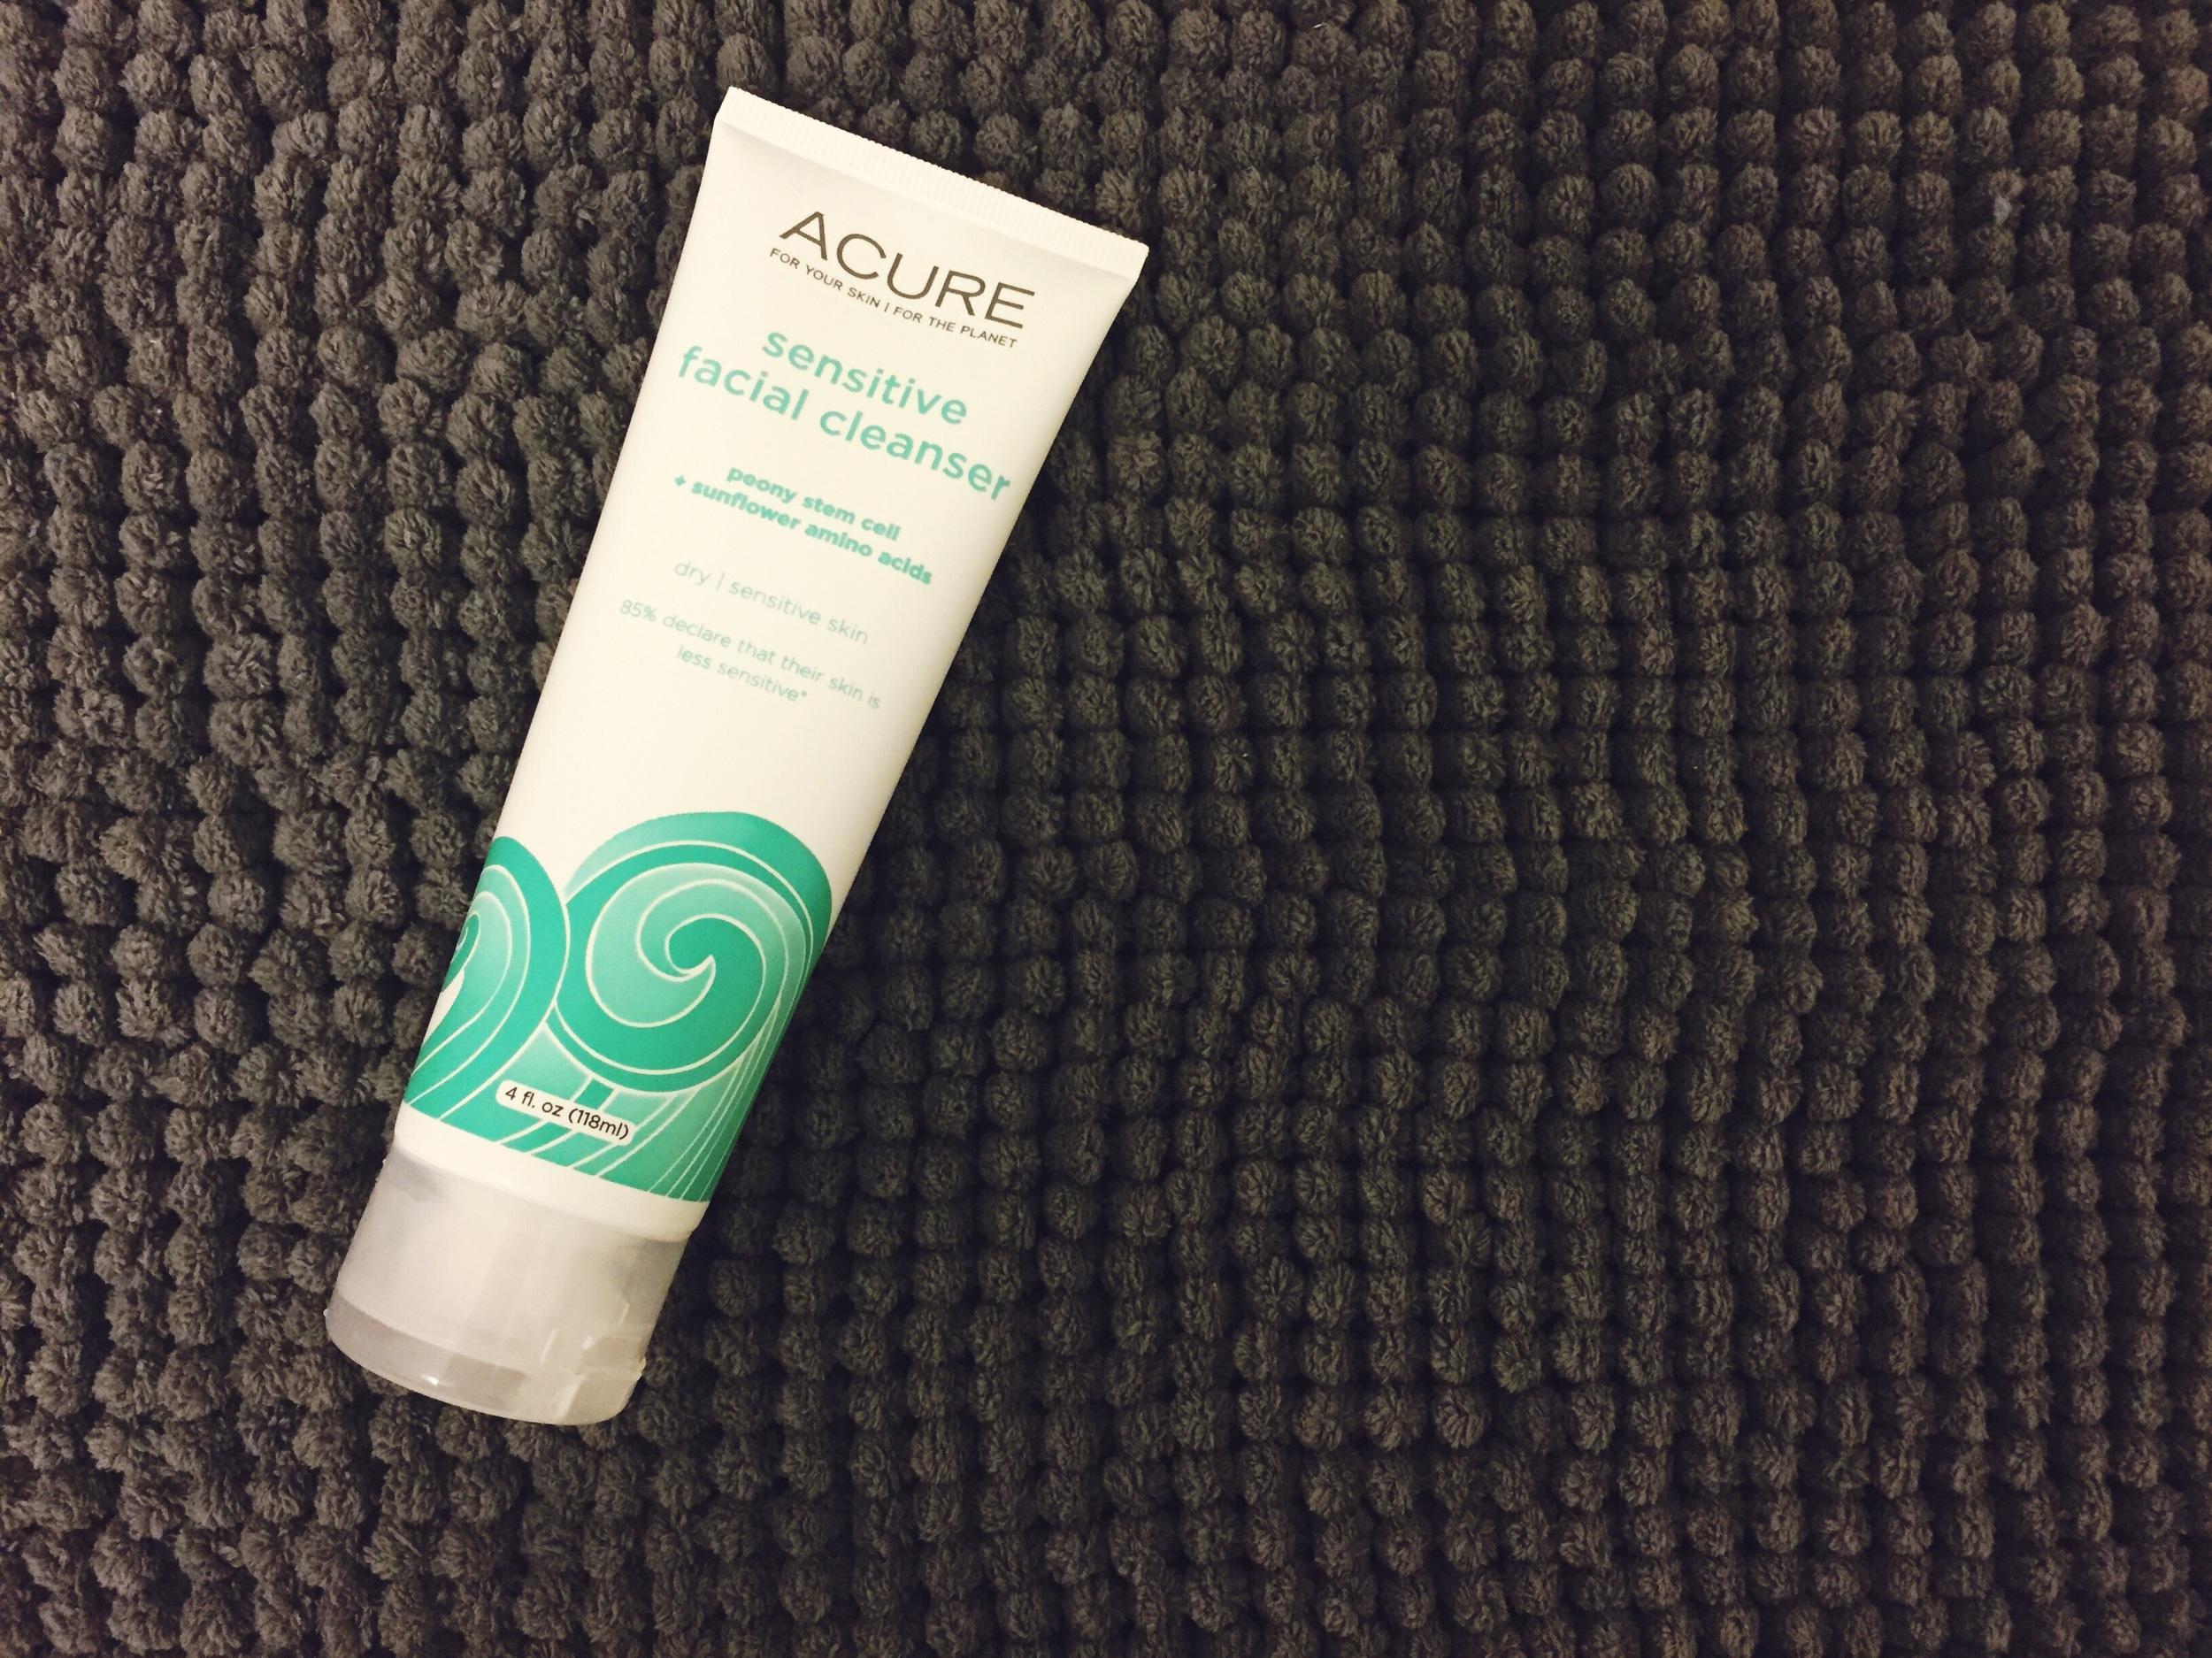 ACURE Organics Sensitive Facial Cleanser Review